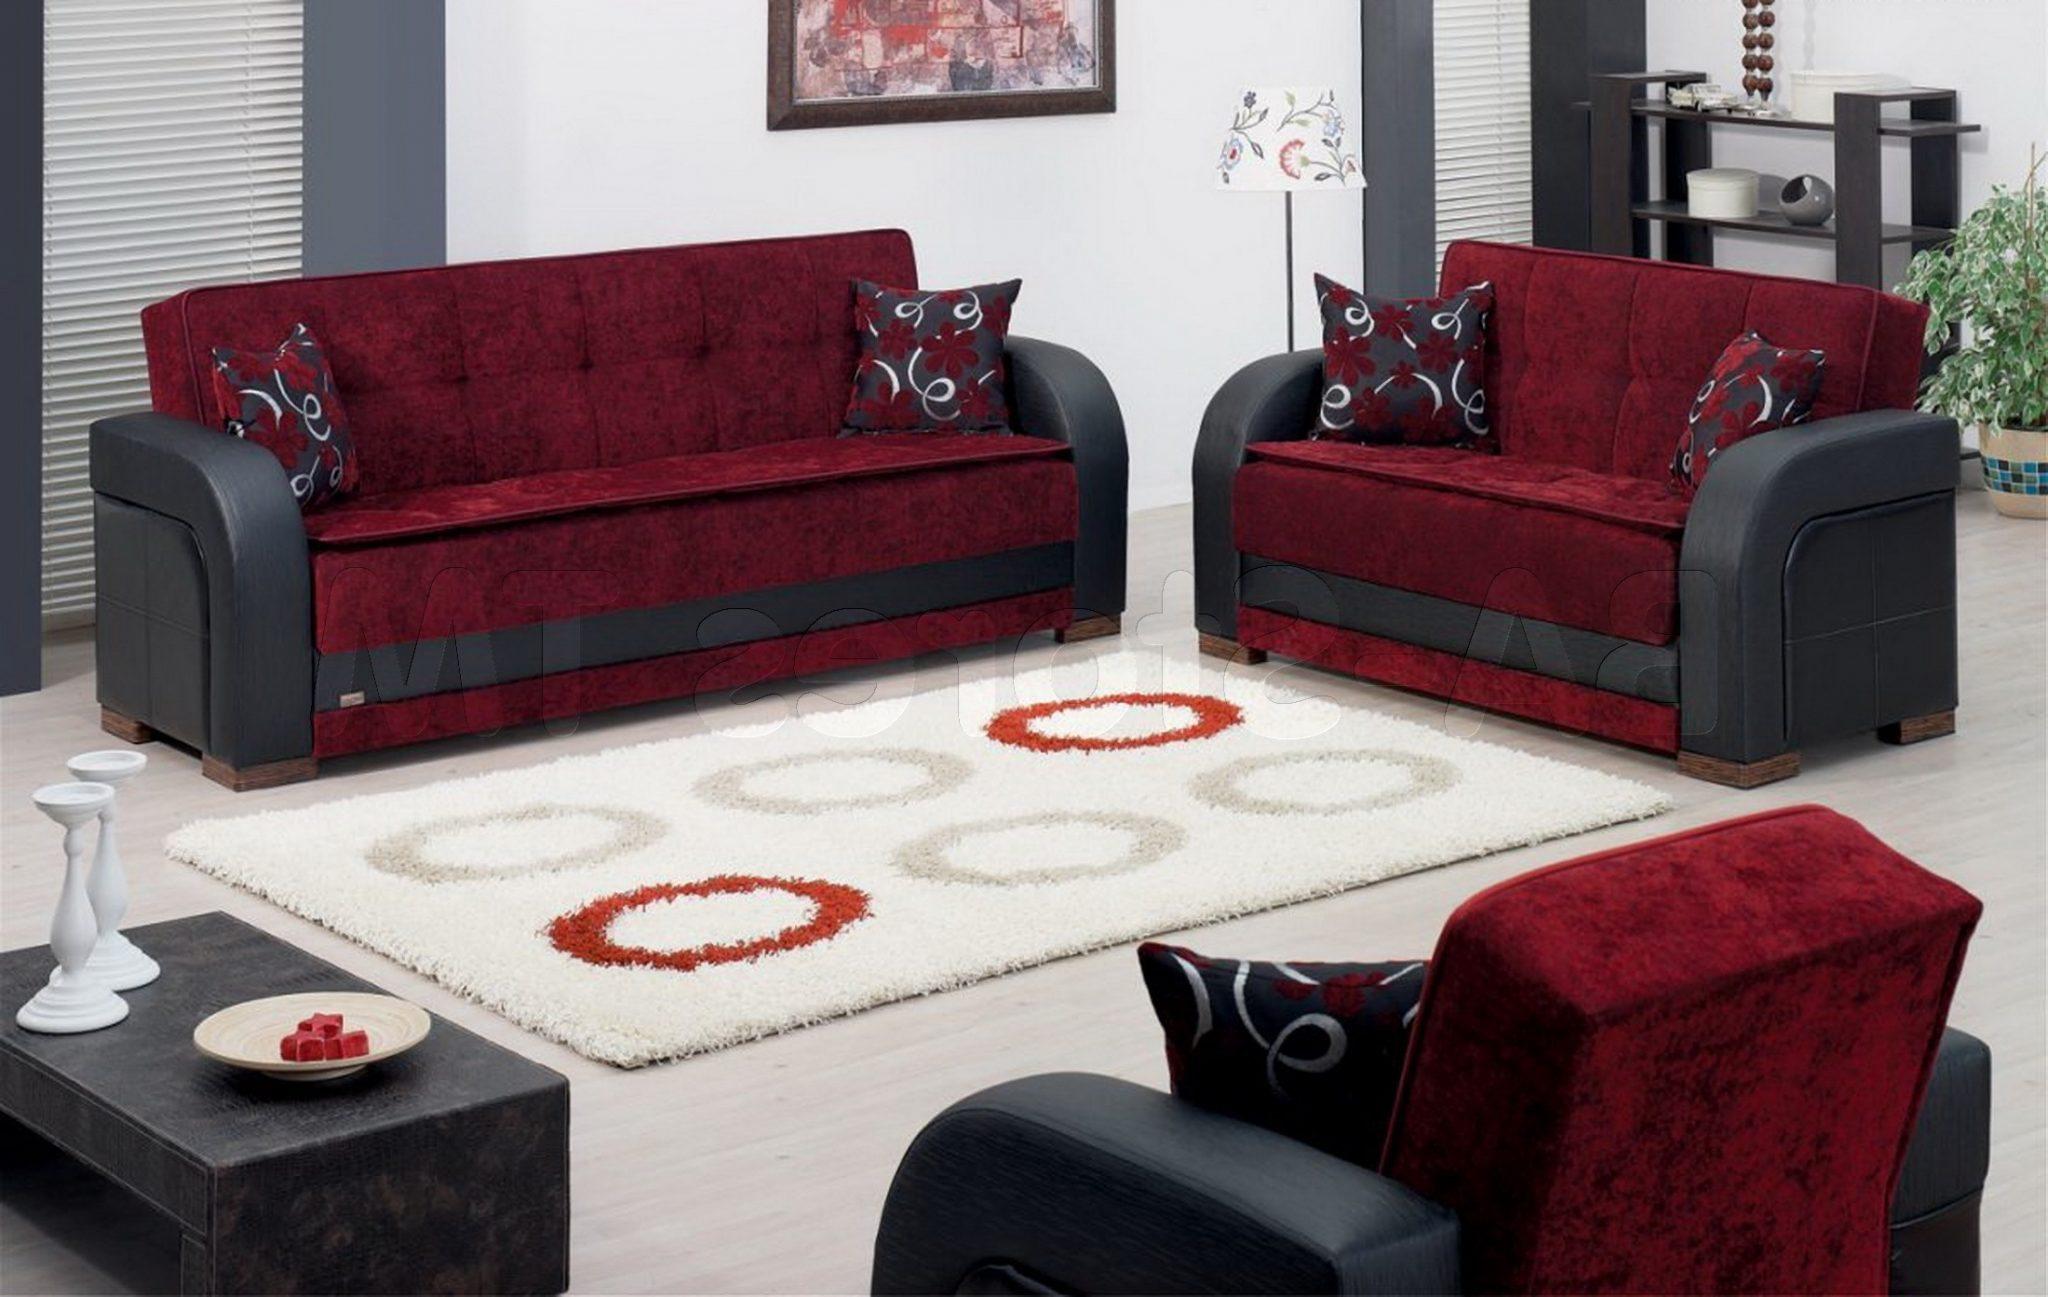 sleeper sofa and loveseat set photo - 8